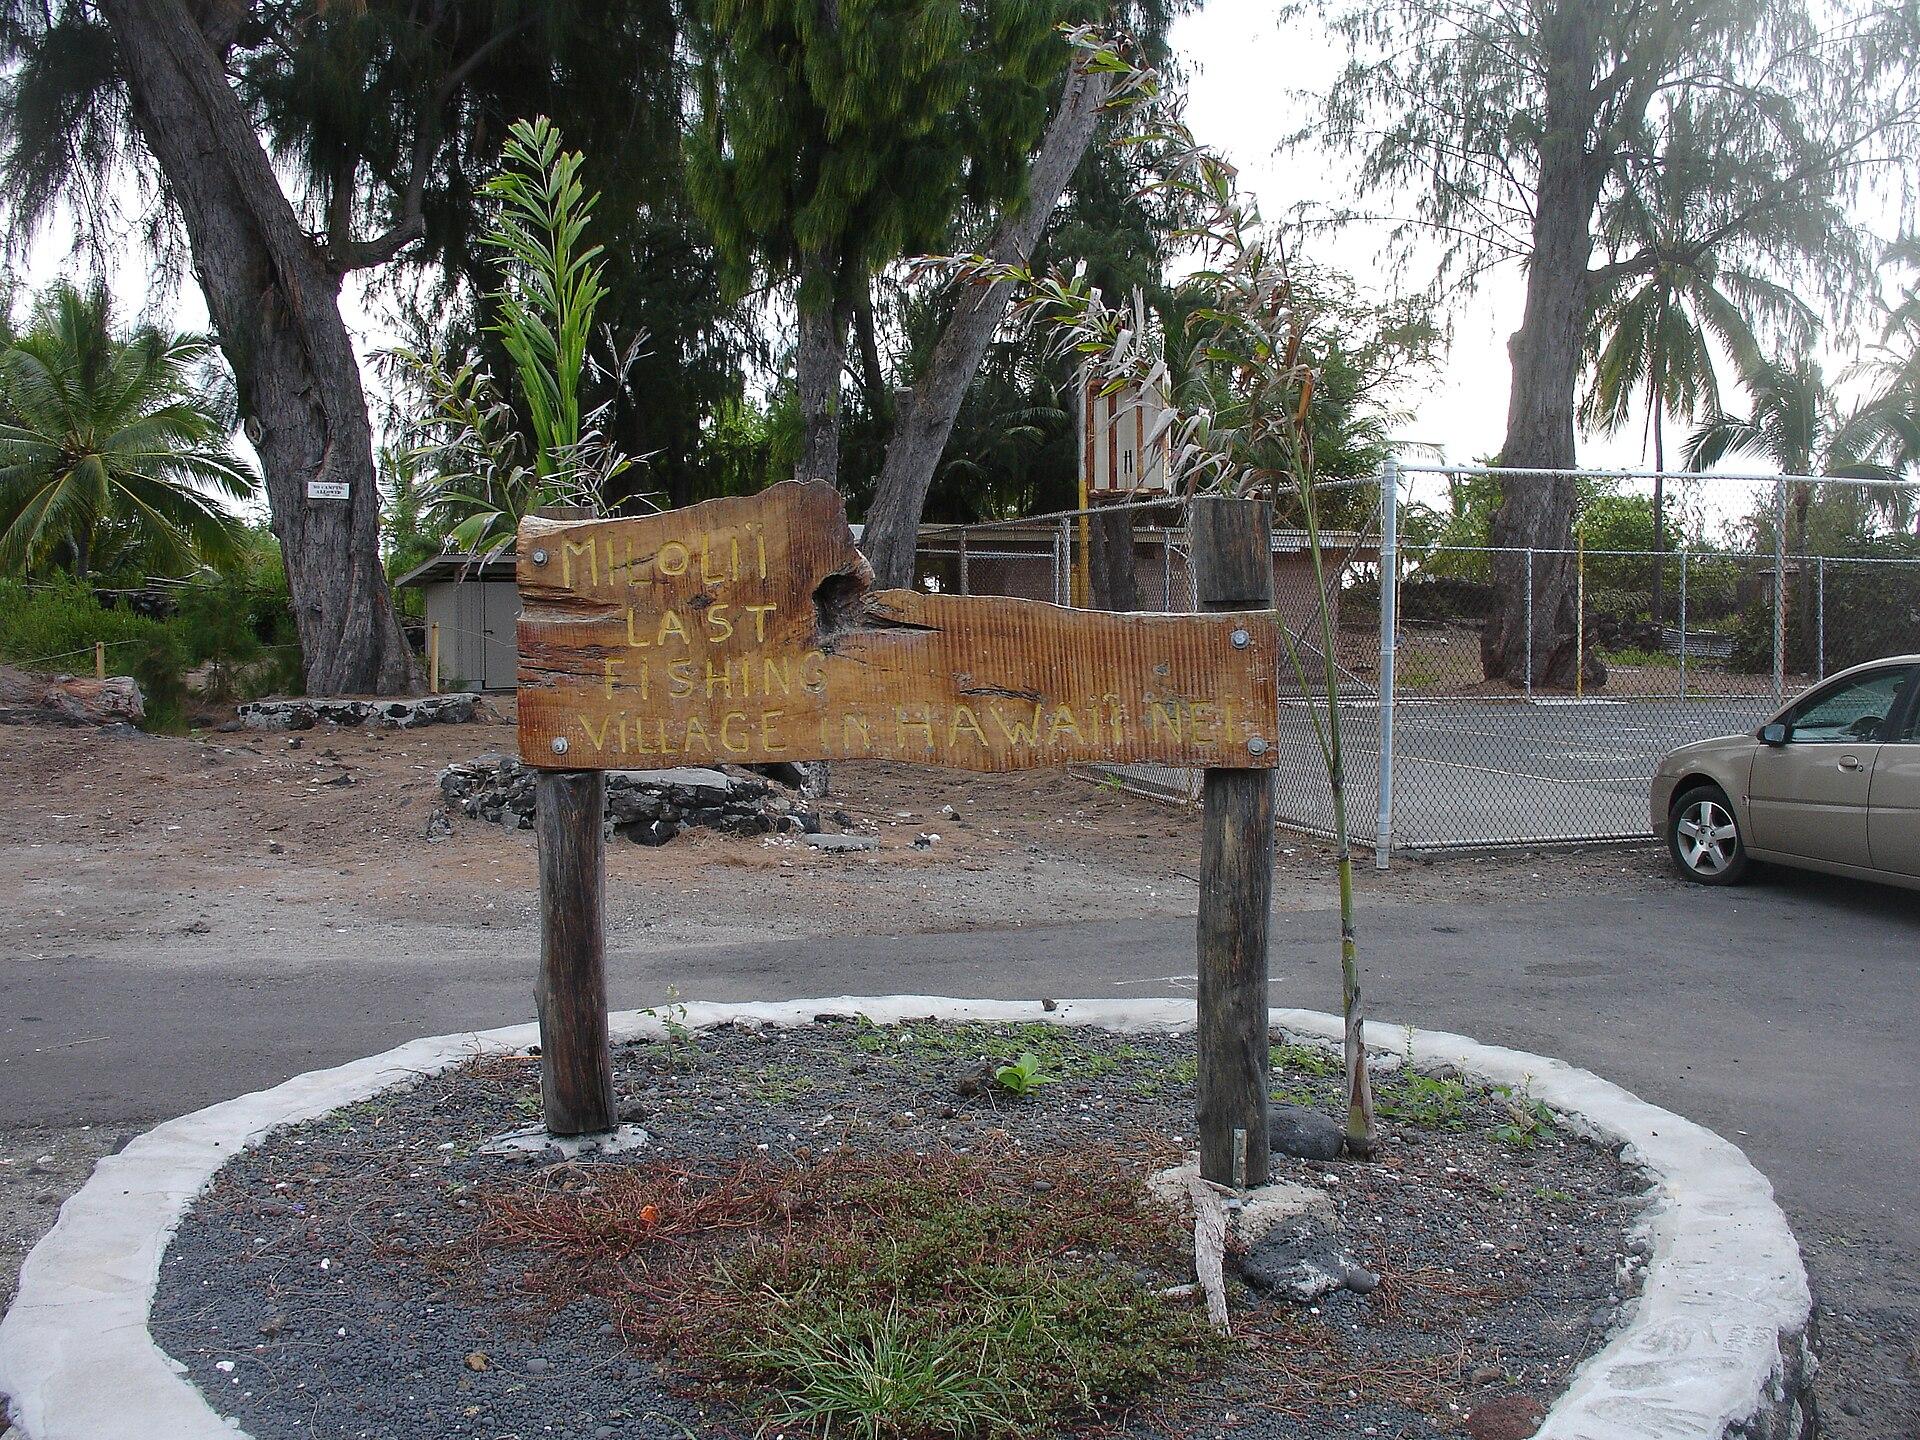 Milolii Hawaii Wikipedia